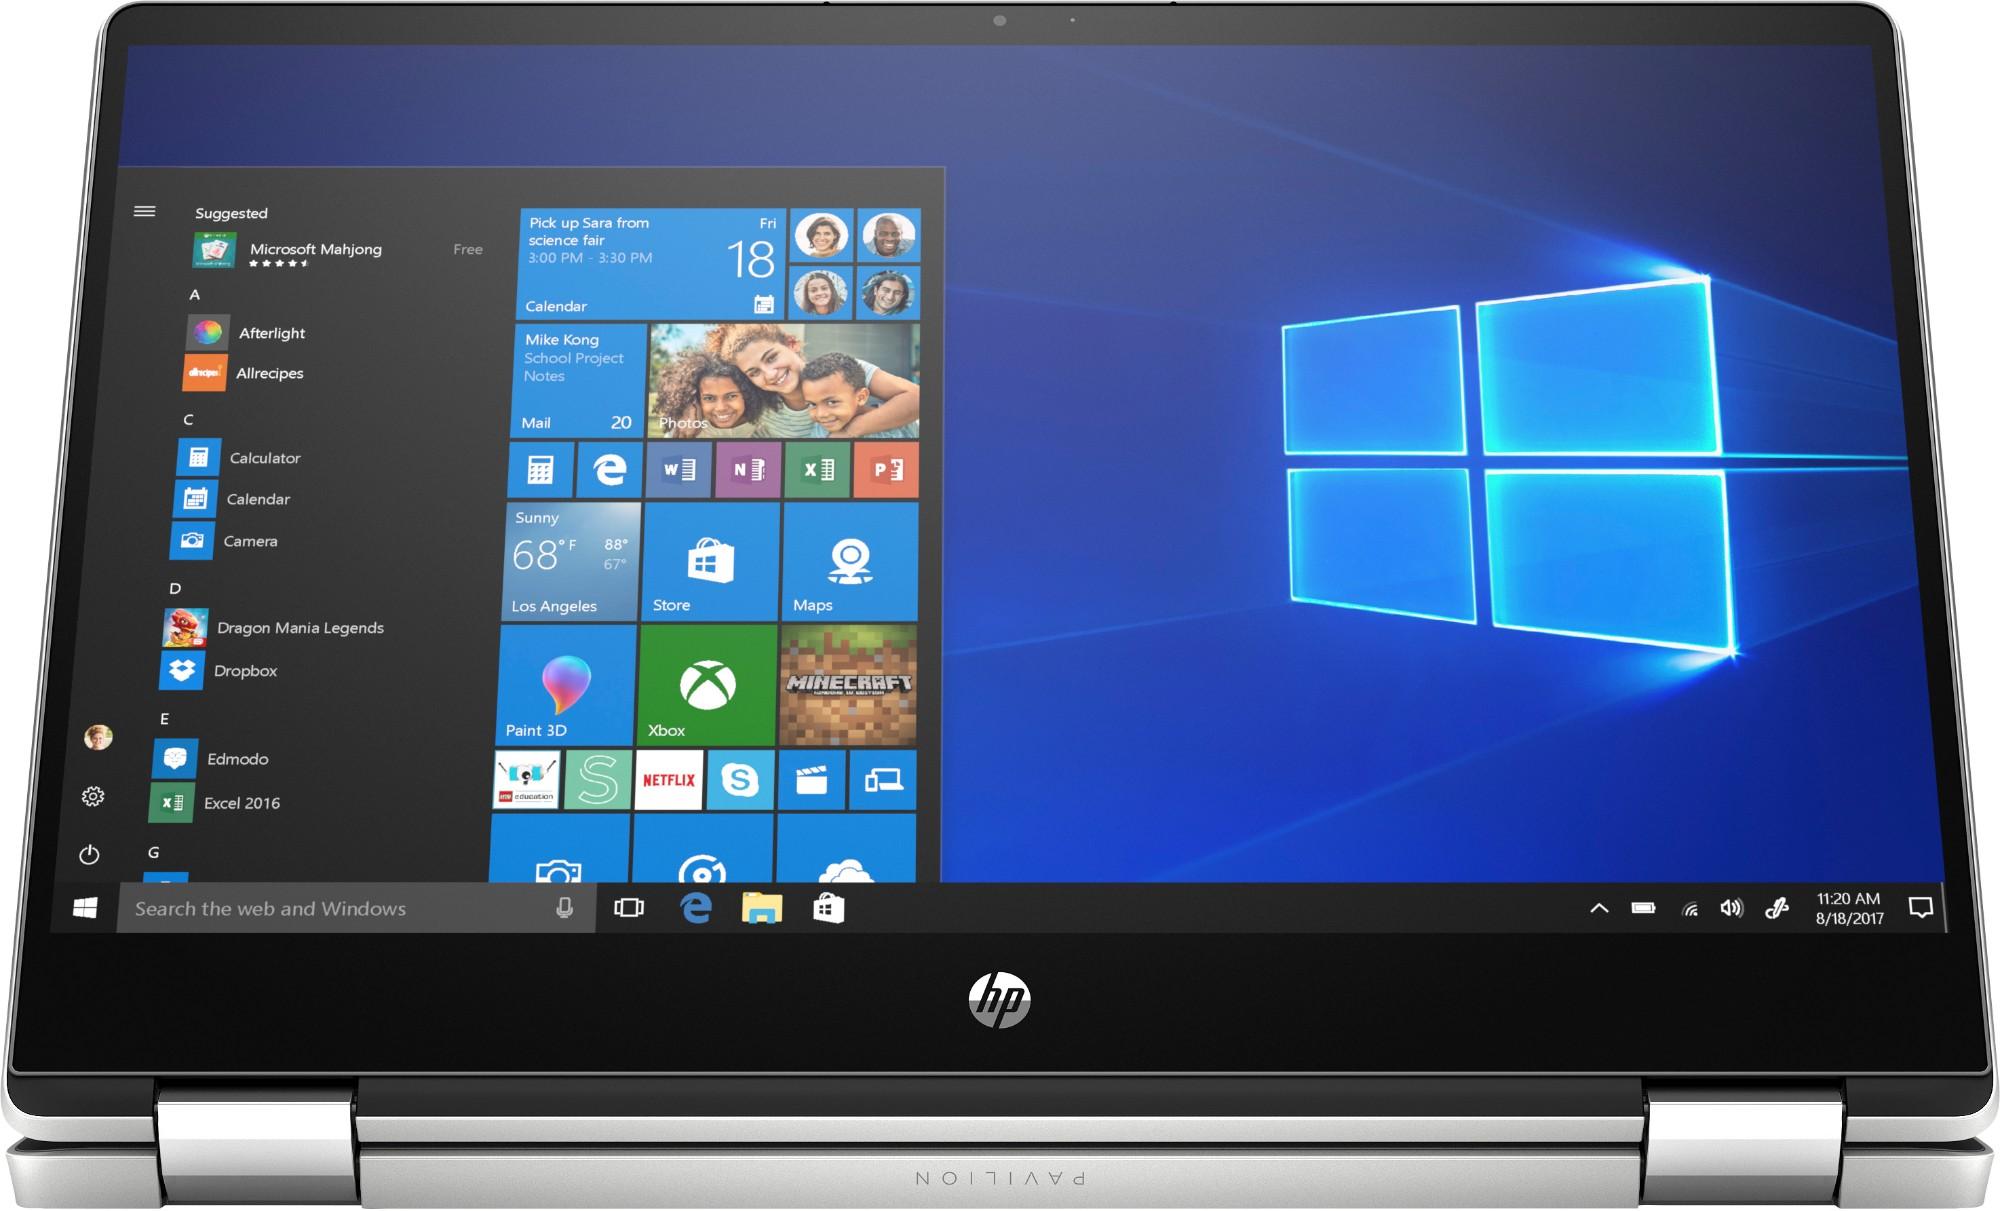 Так выглядит ноутбук HP Pavilion 14-dh0023ur x360